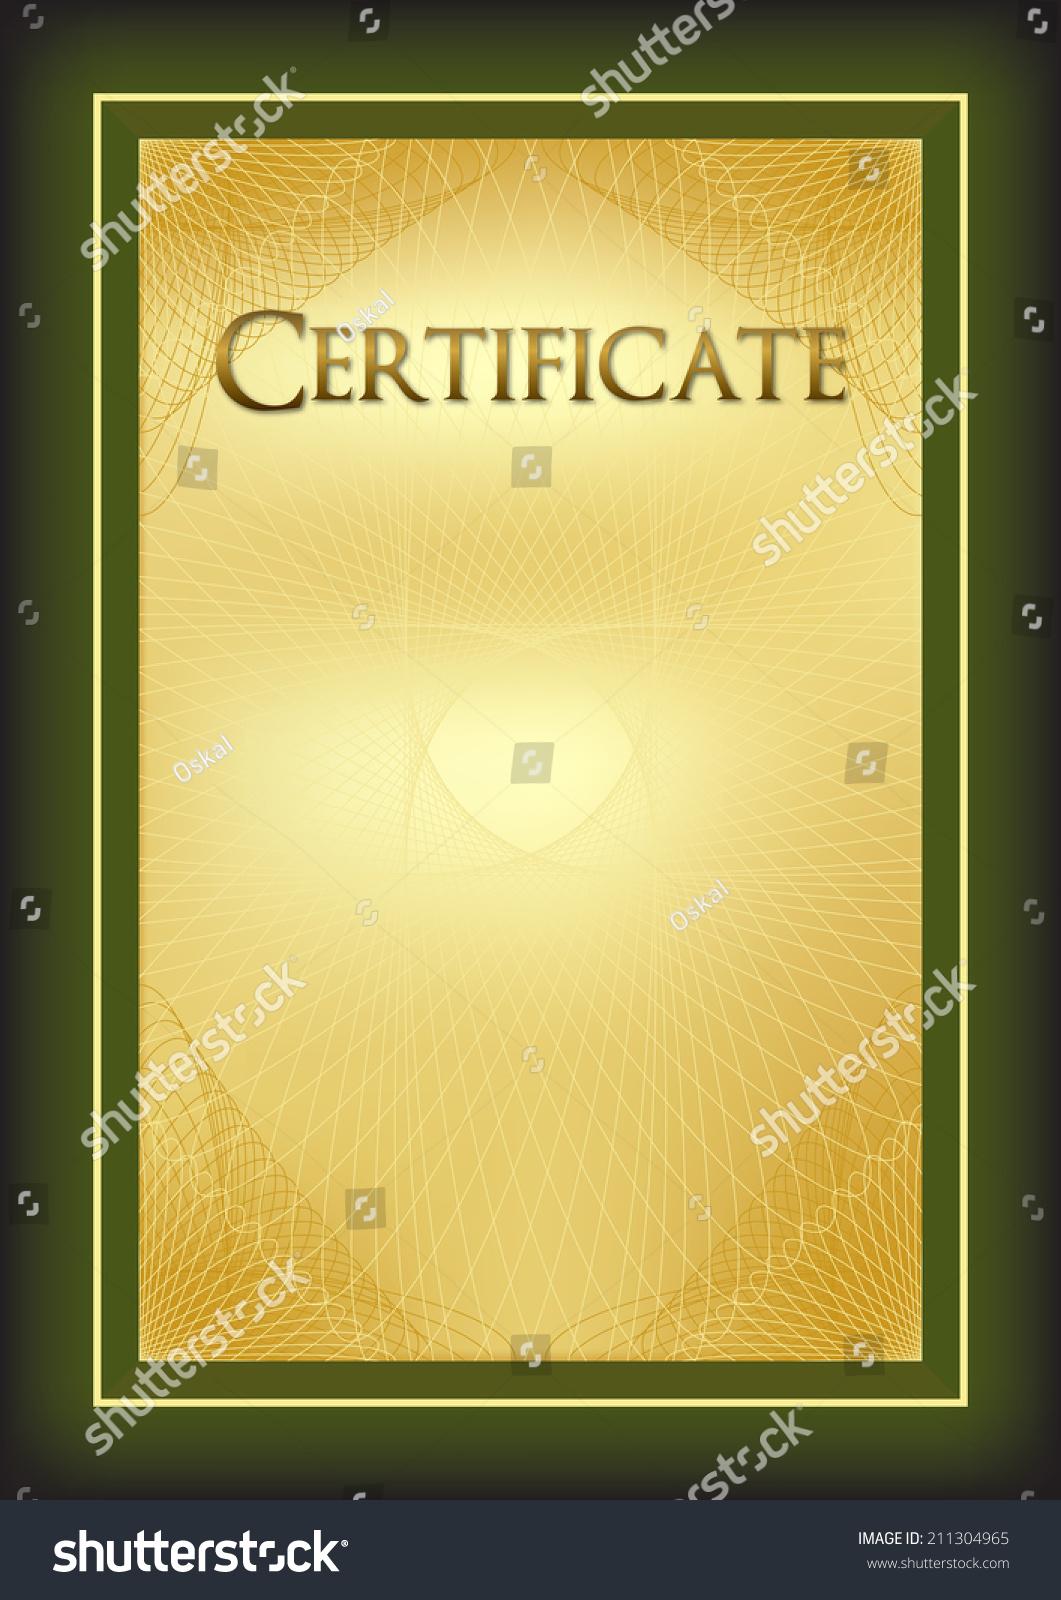 certificate diploma award background create base stock vector  certificate diploma award background to create a base certificate diploma gift